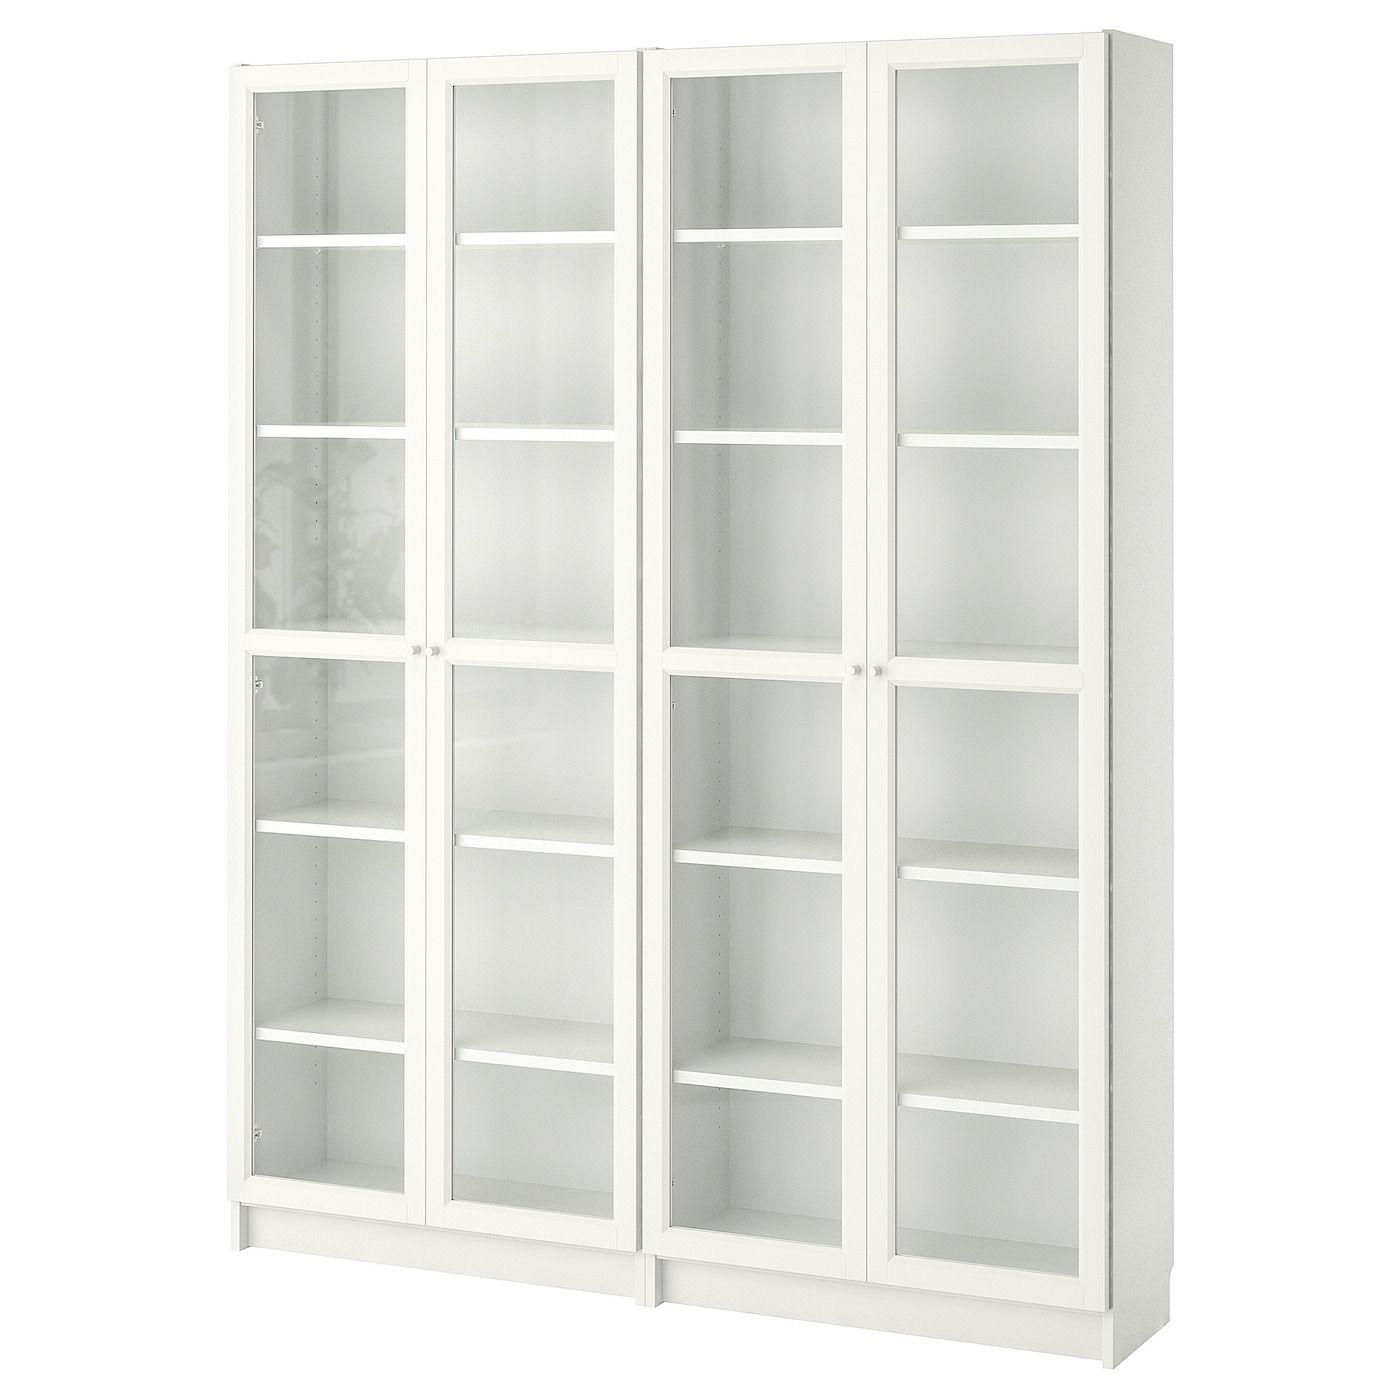 Billy Oxberg Bookcase White Glass 63x11 3 4x79 1 2 Ikea In 2020 Glass Bookcase Bookcase With Glass Doors White Bookcase